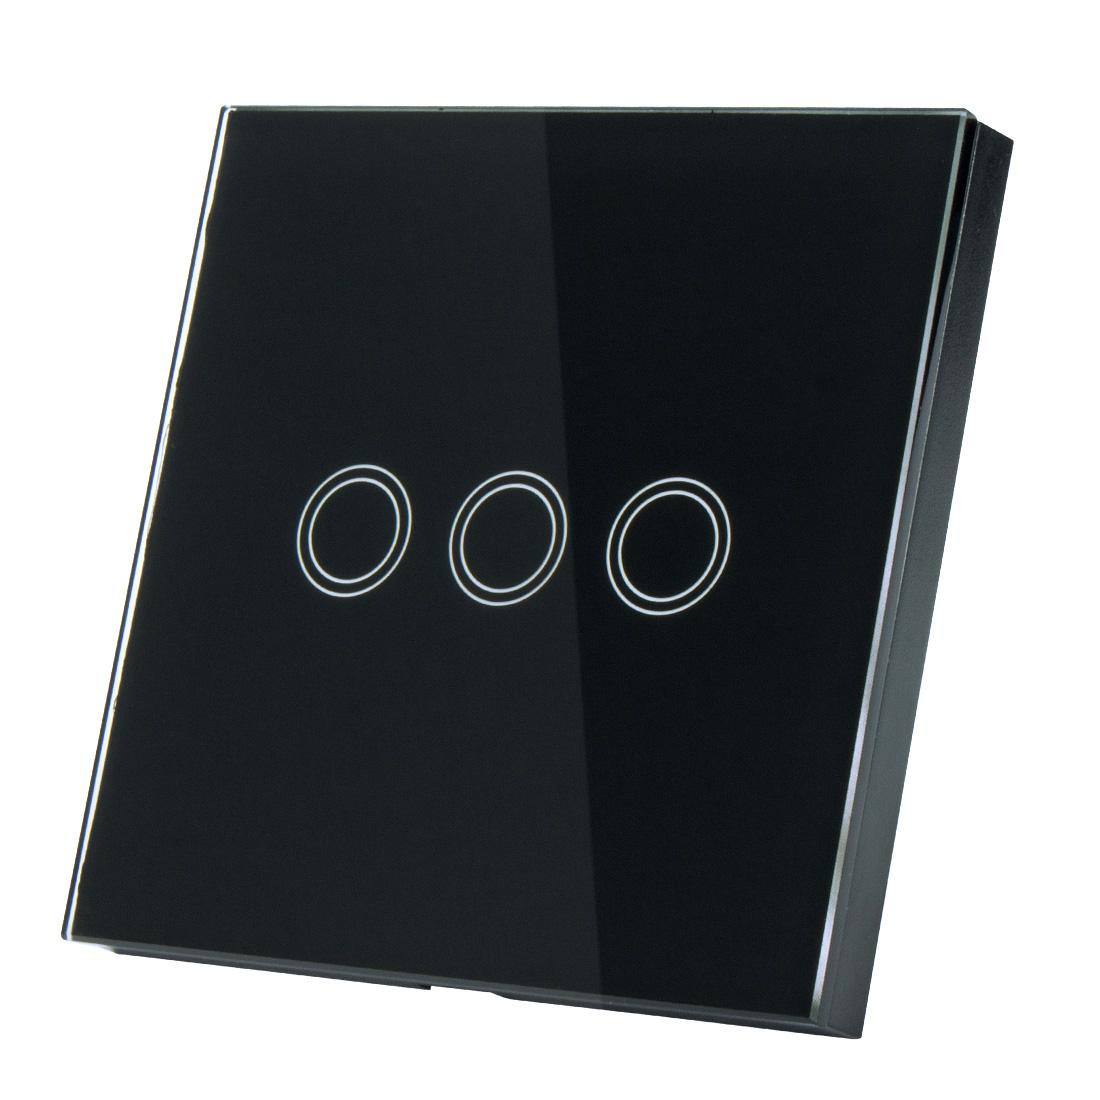 AC 110-240V 1 Way 3 Gang Glass Panel Wall Light Smart Touch Switch Black EU